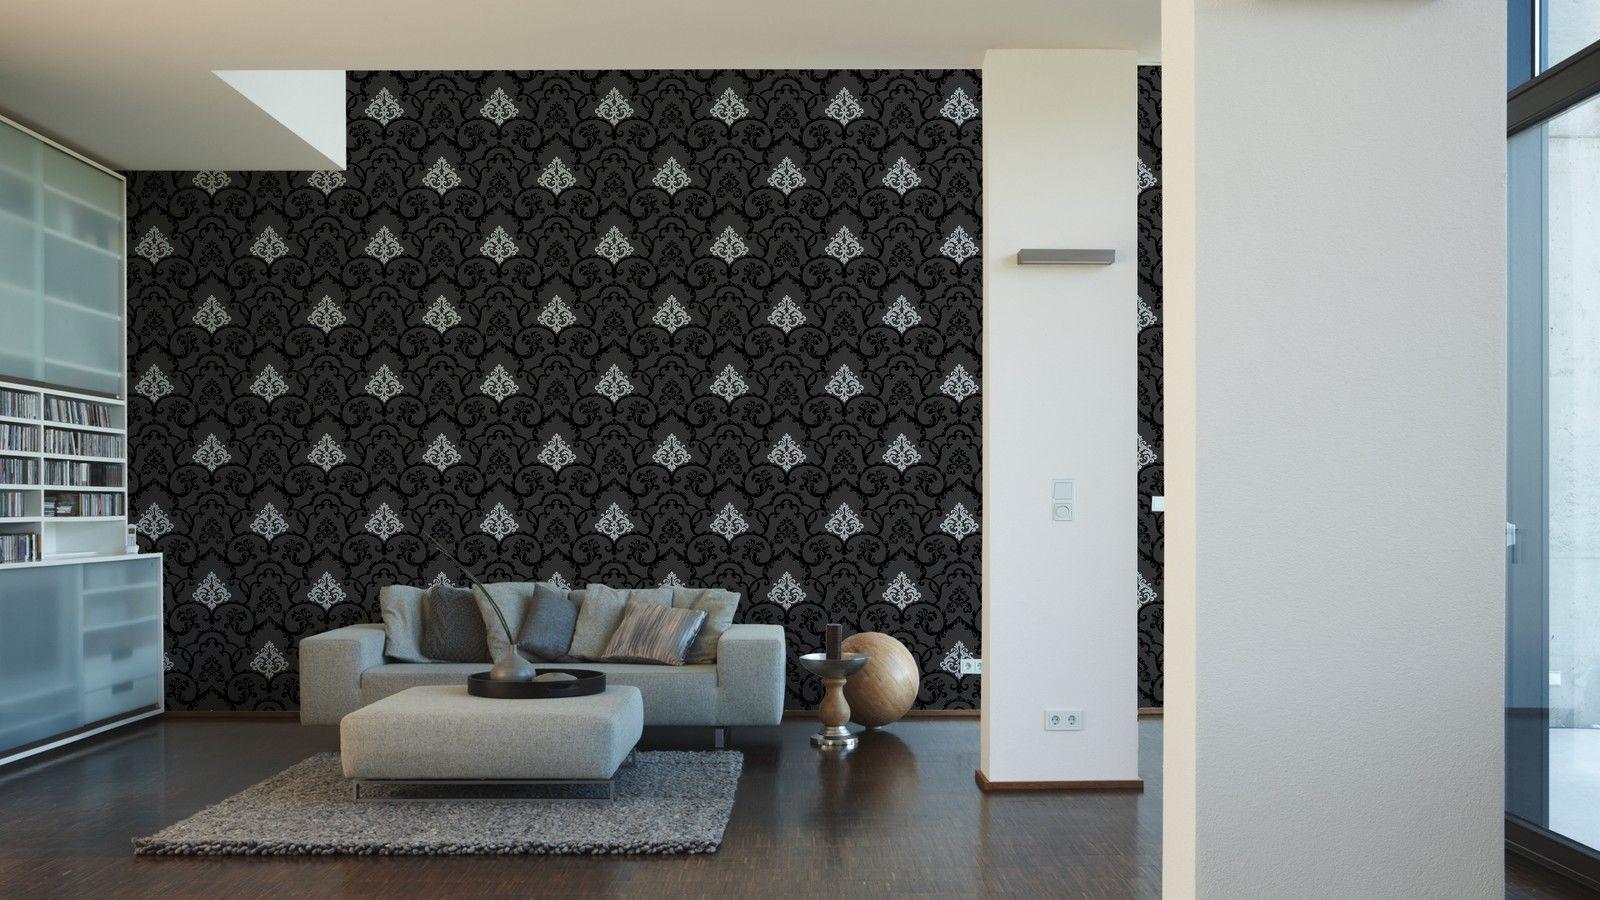 vlies tapete barock muster ornament schwarz silber glanz effekt klassisch royal kaufen bei. Black Bedroom Furniture Sets. Home Design Ideas